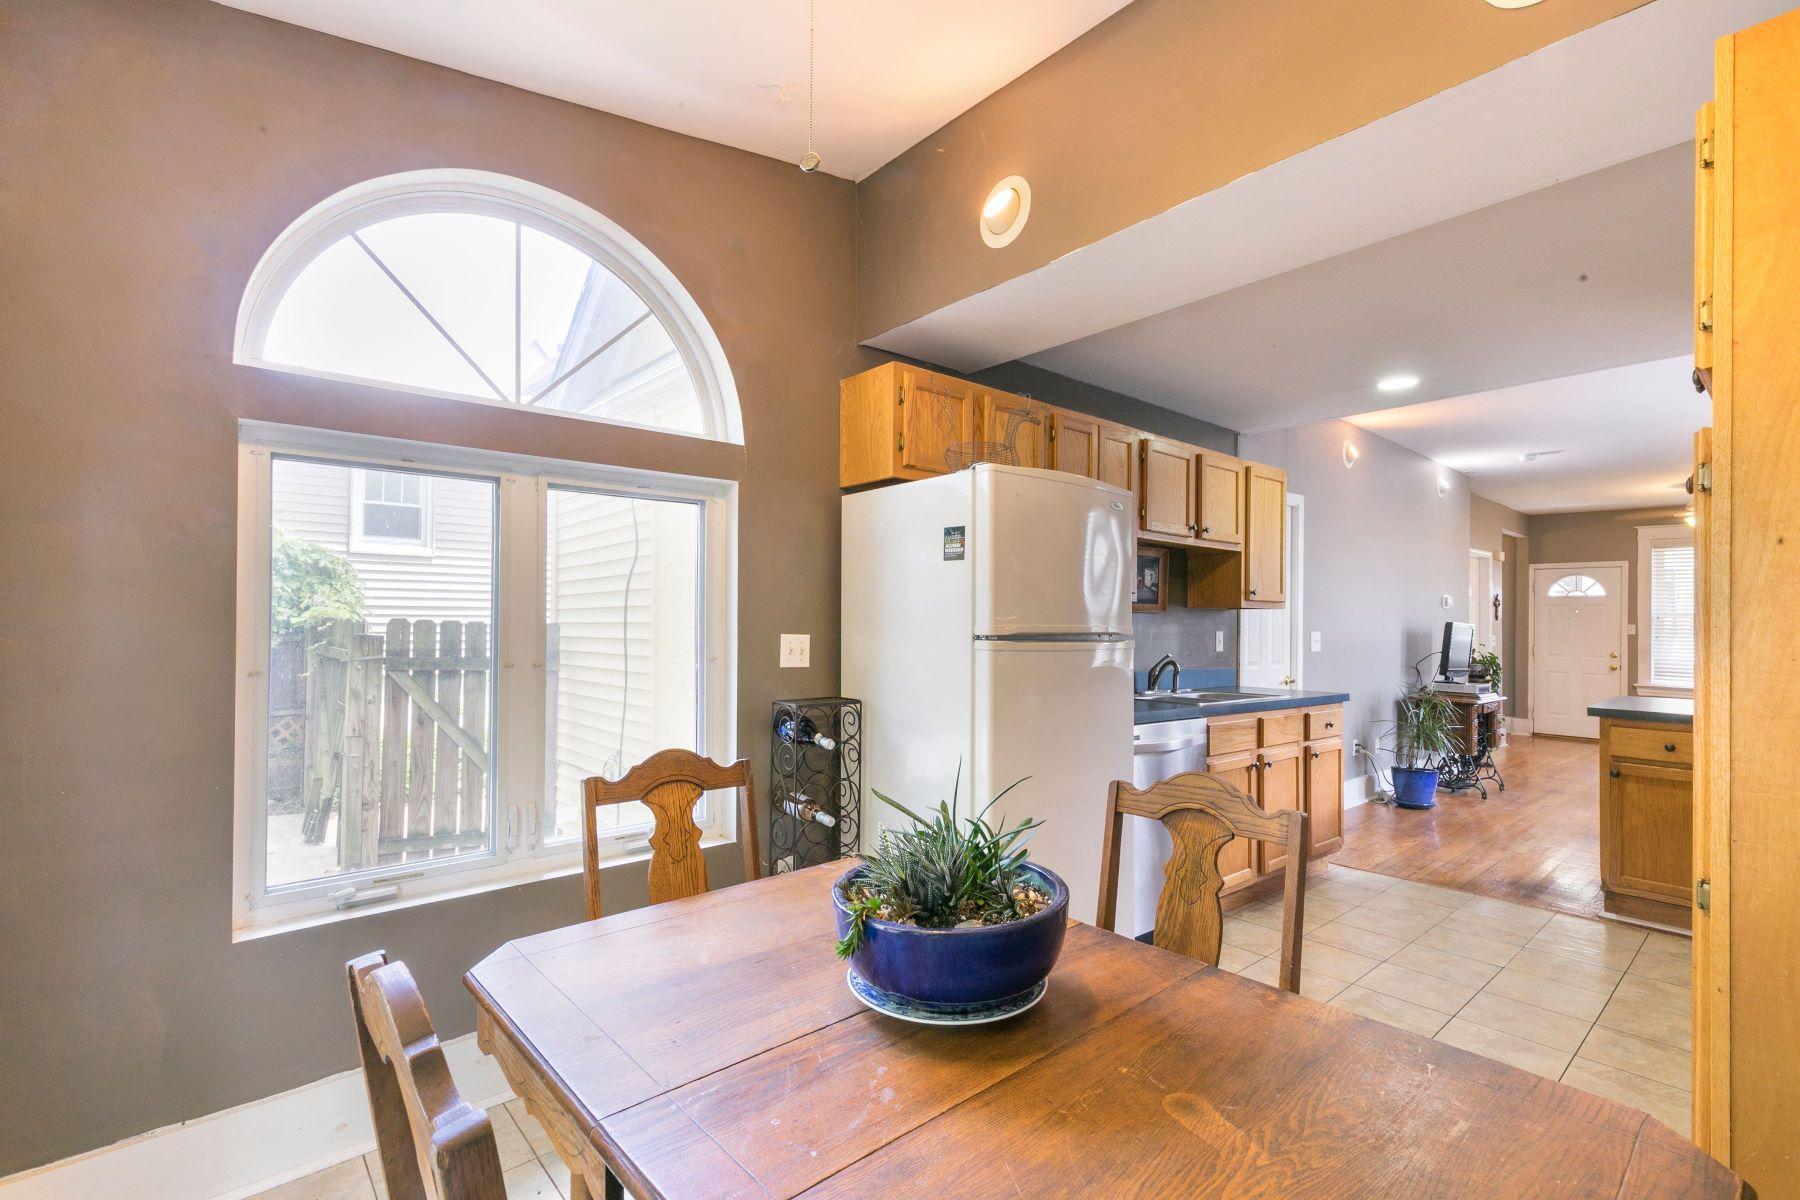 Additional photo for property listing at Adorable Bungalow 7435 Lohmeyer Avenue Maplewood, Missouri 63143 United States